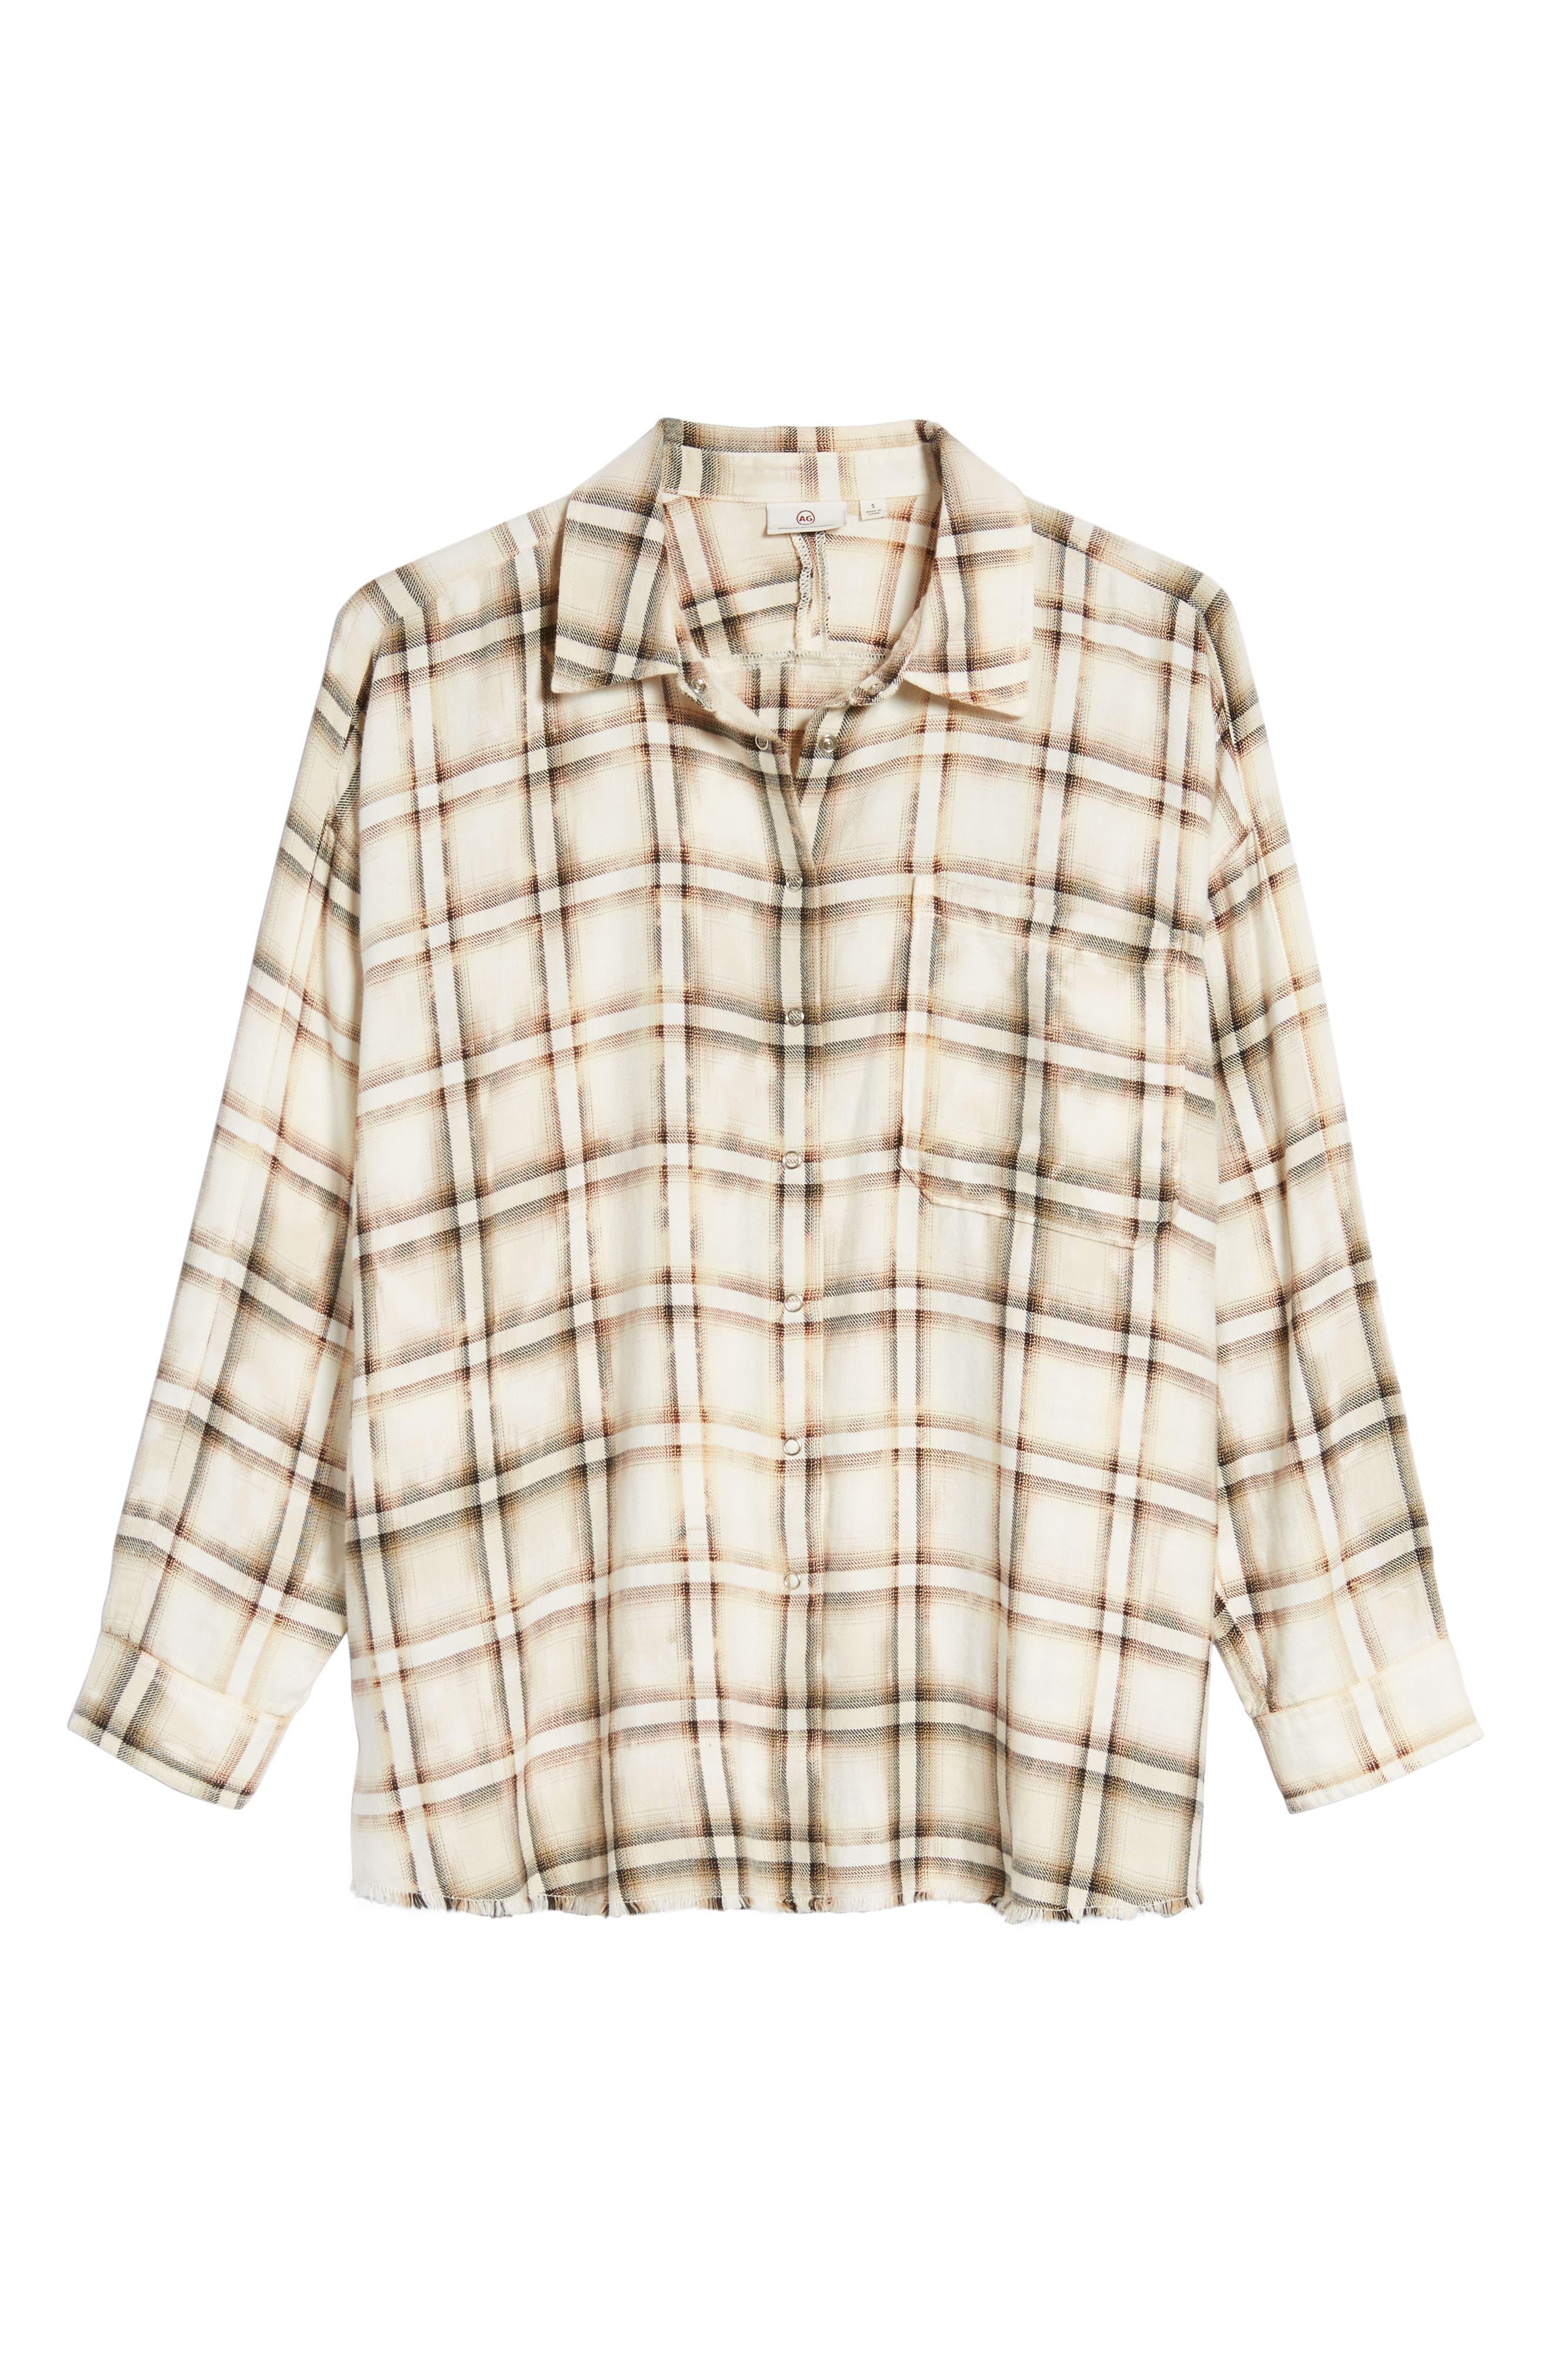 Josie Flannel Shirt,                             Alternate thumbnail 6, color,                             909